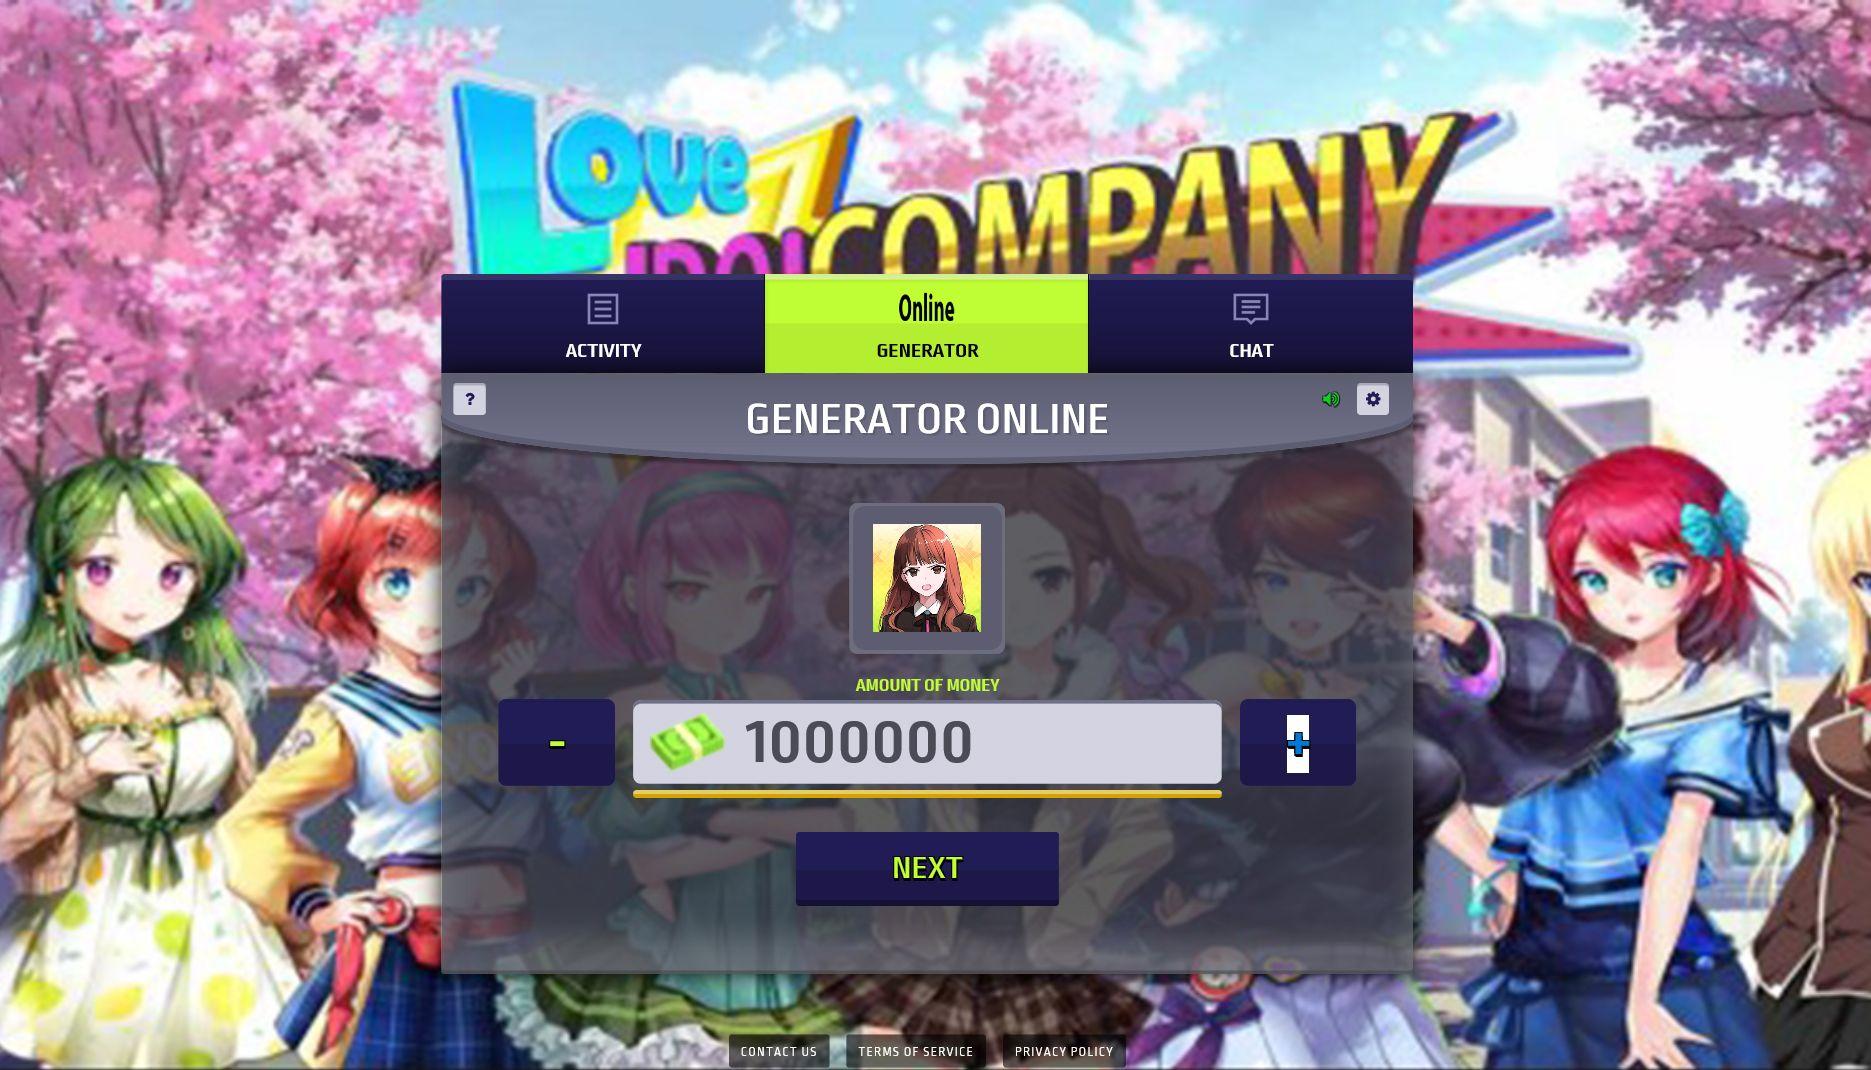 Love Idol Company Kpop Girls Hack Money And Starcoin How To Get Money Idol Kpop Girls